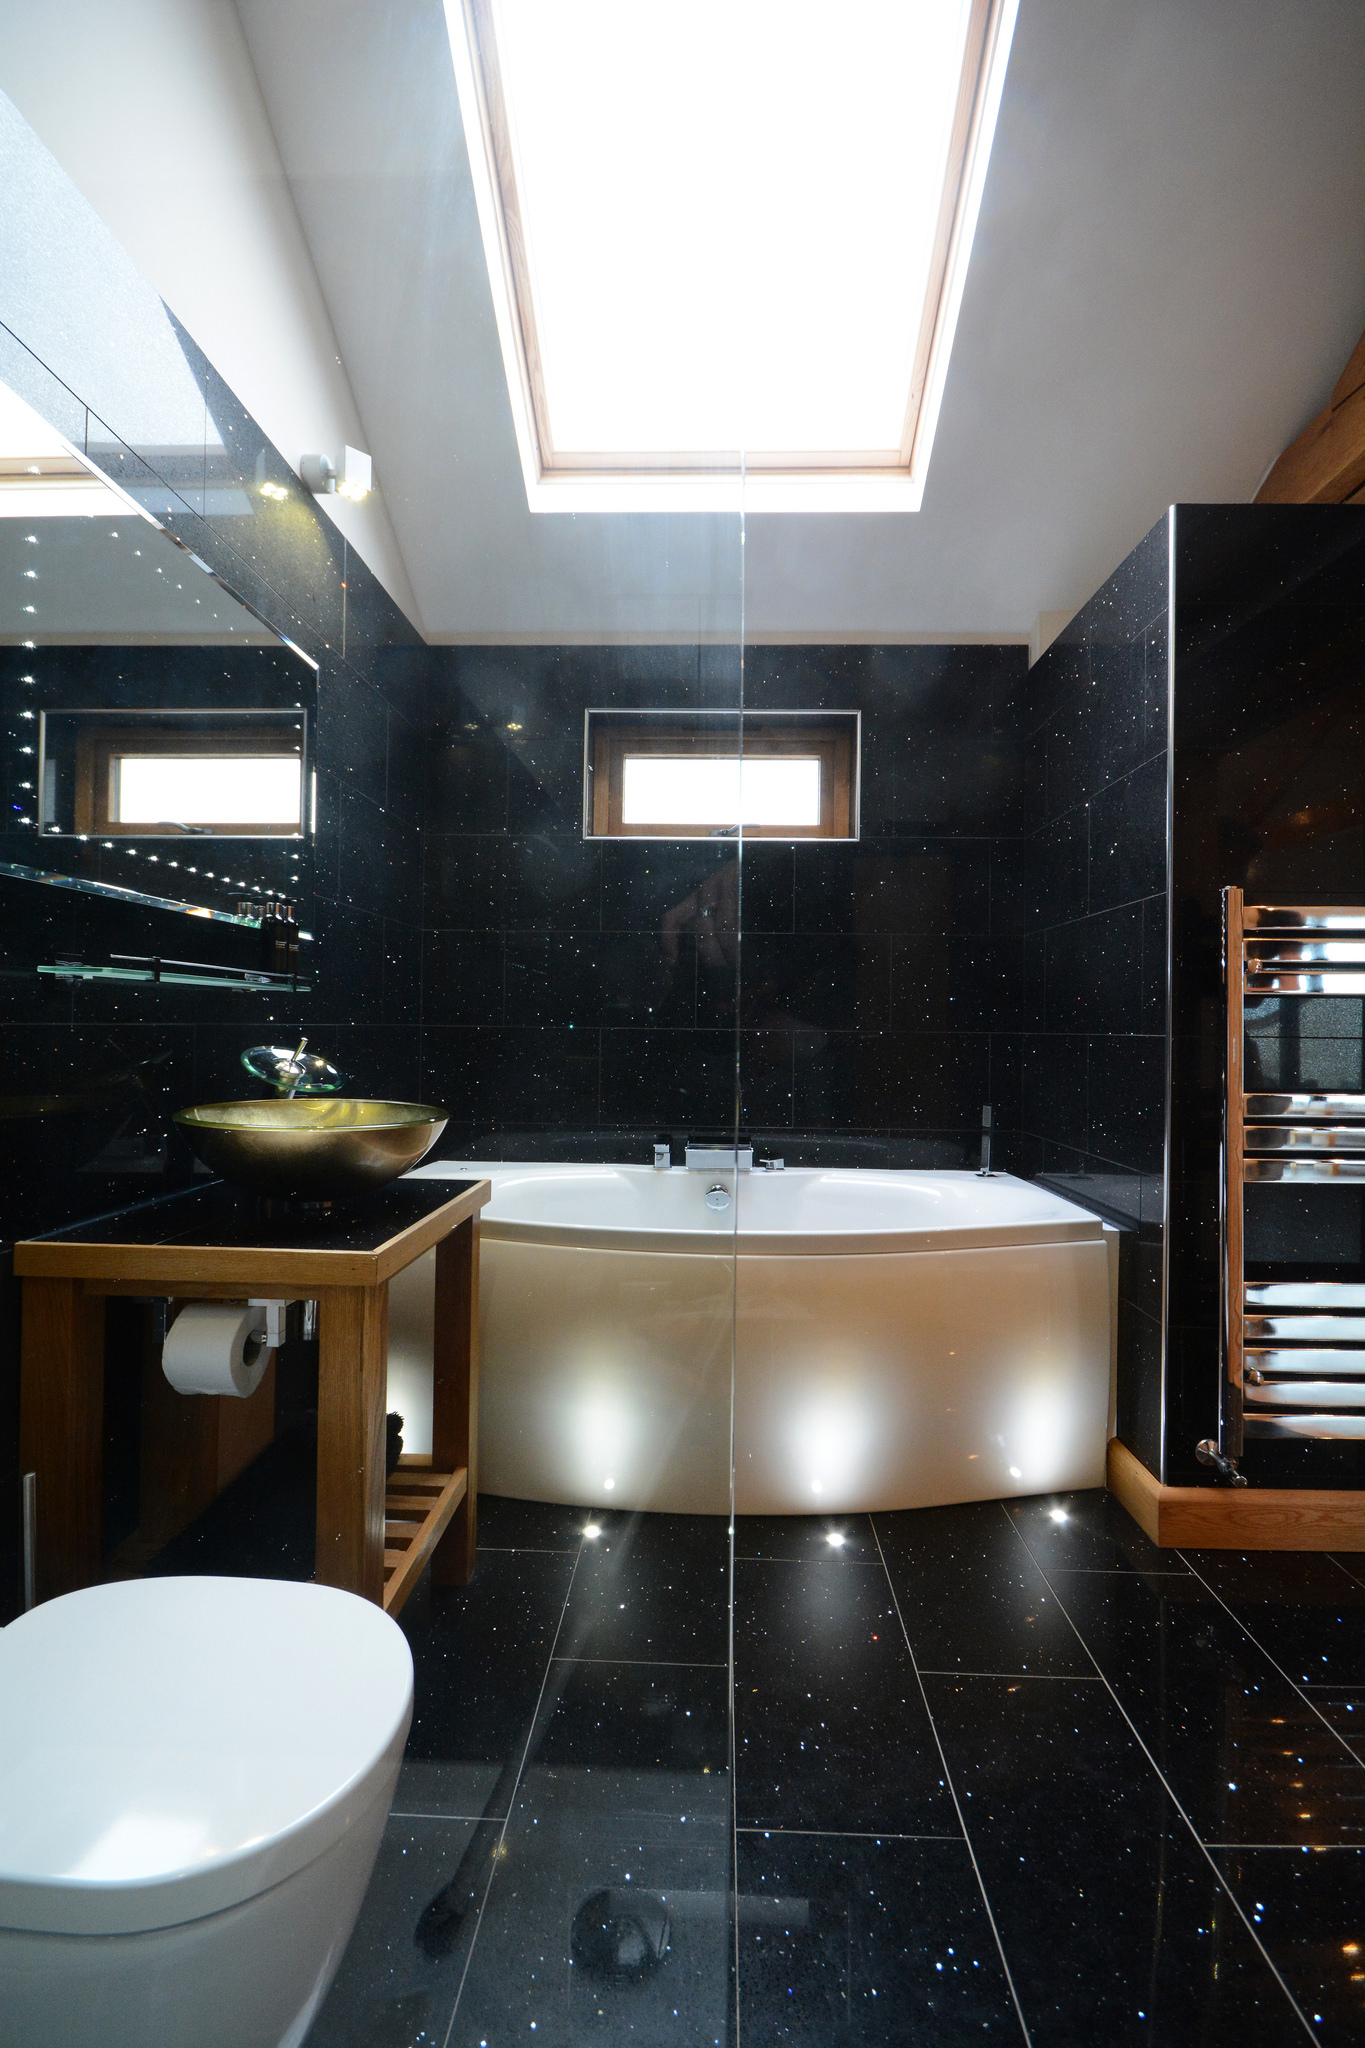 Relaxing spa bath